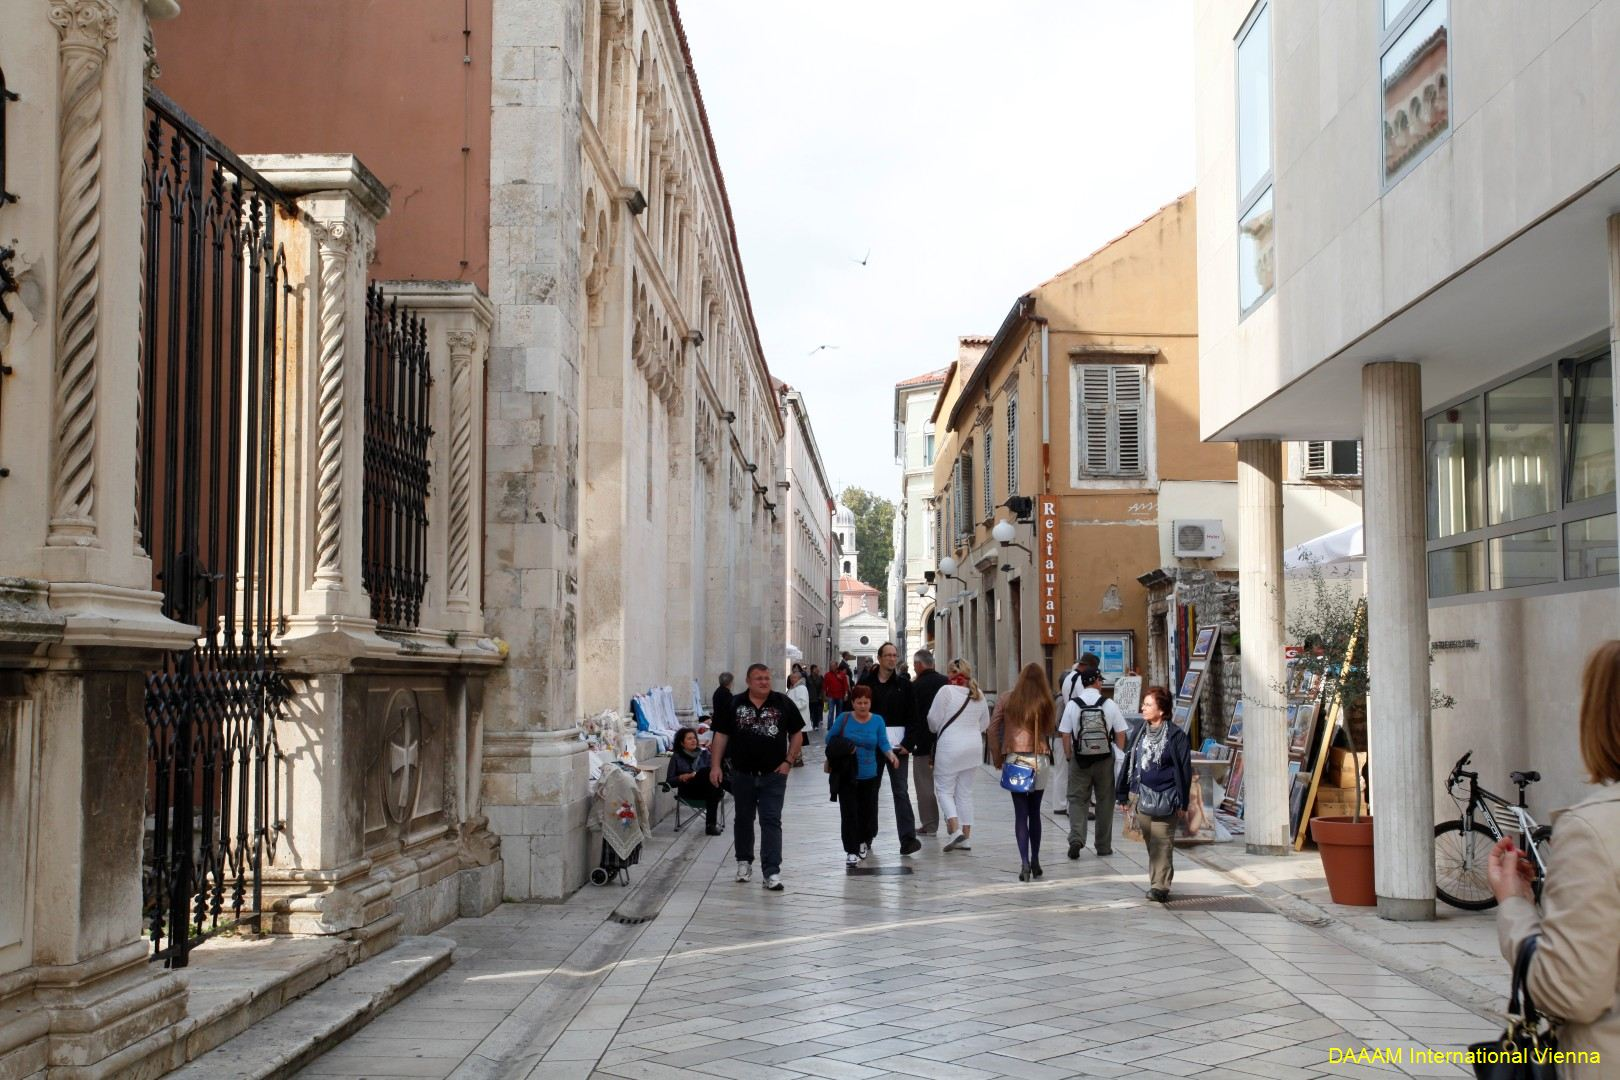 DAAAM_2012_Zadar_00_Zadar_City_061